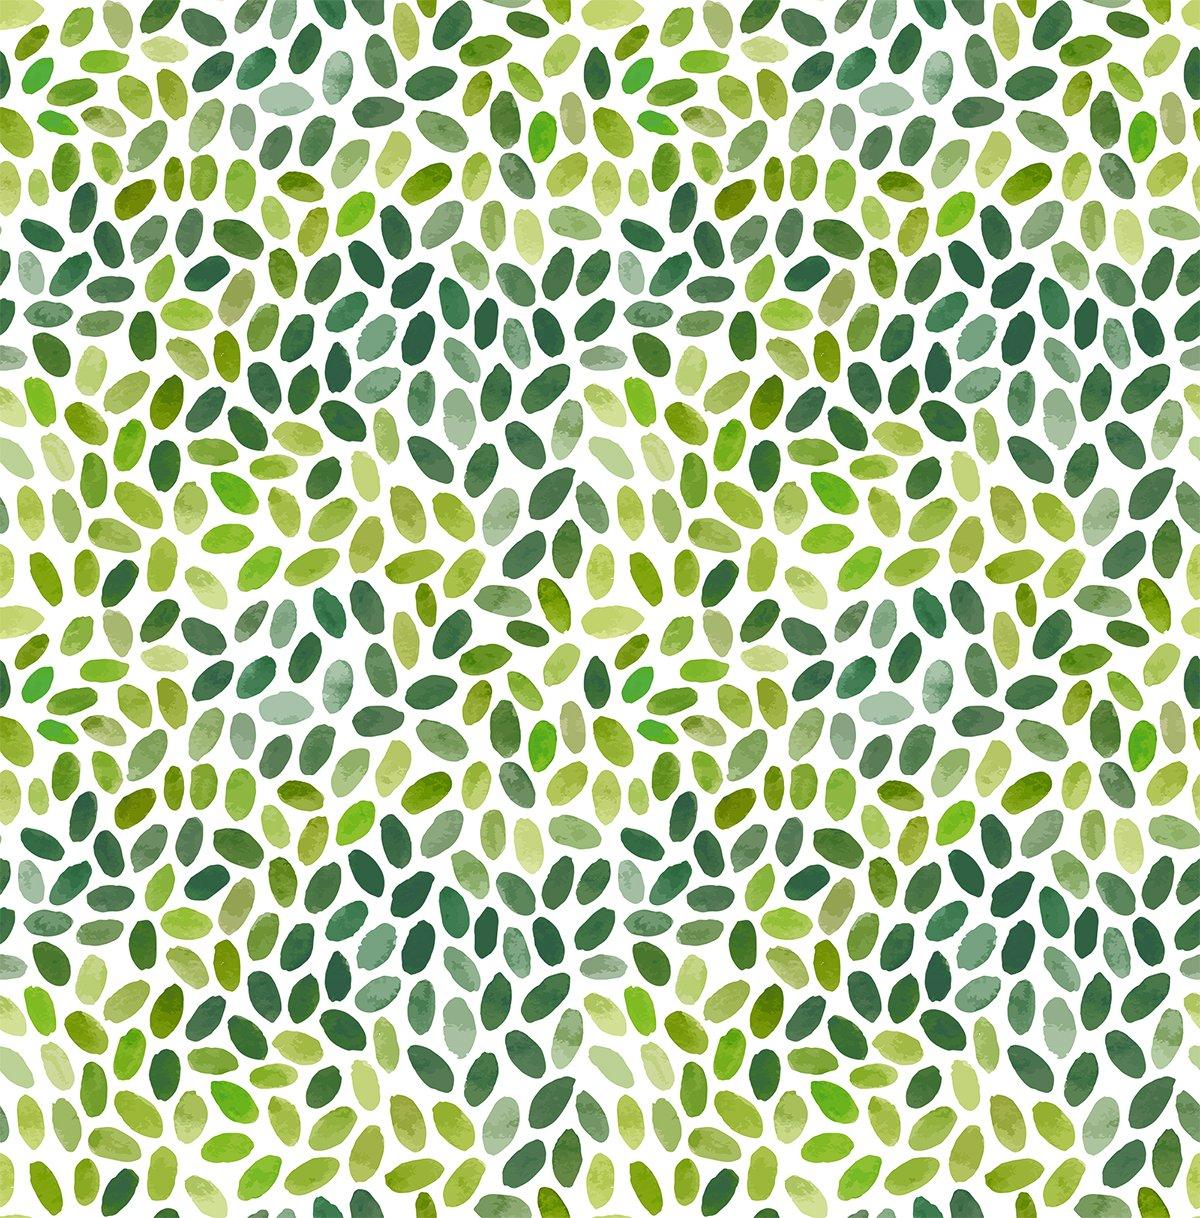 WWQSH 2021 Green Leaves PRE-ORDER